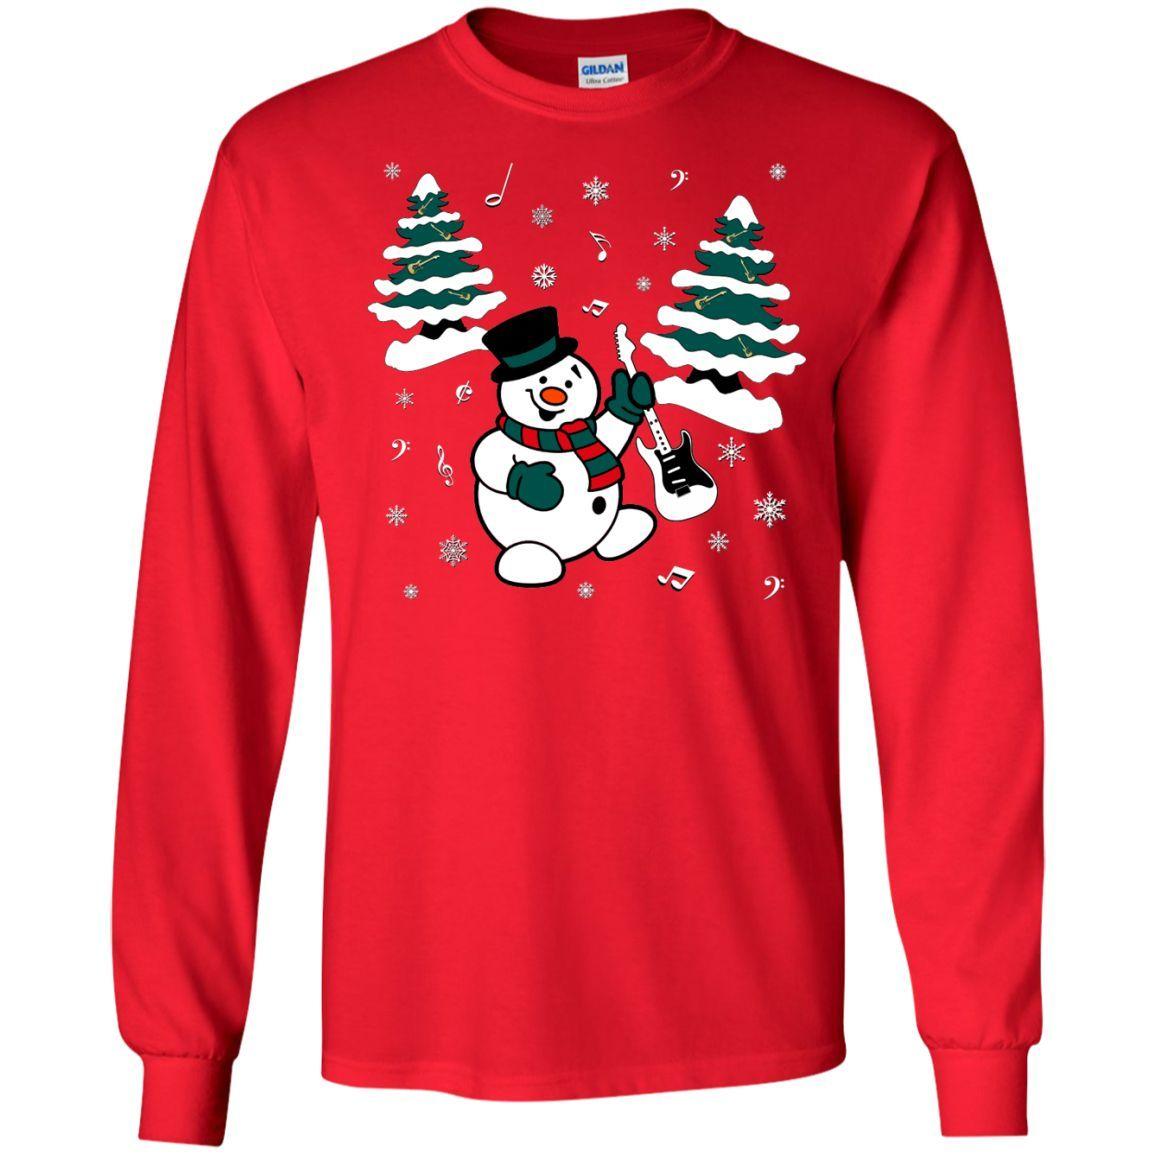 Snowman With Electric Guitar Long Sleeve/Sweatshirt